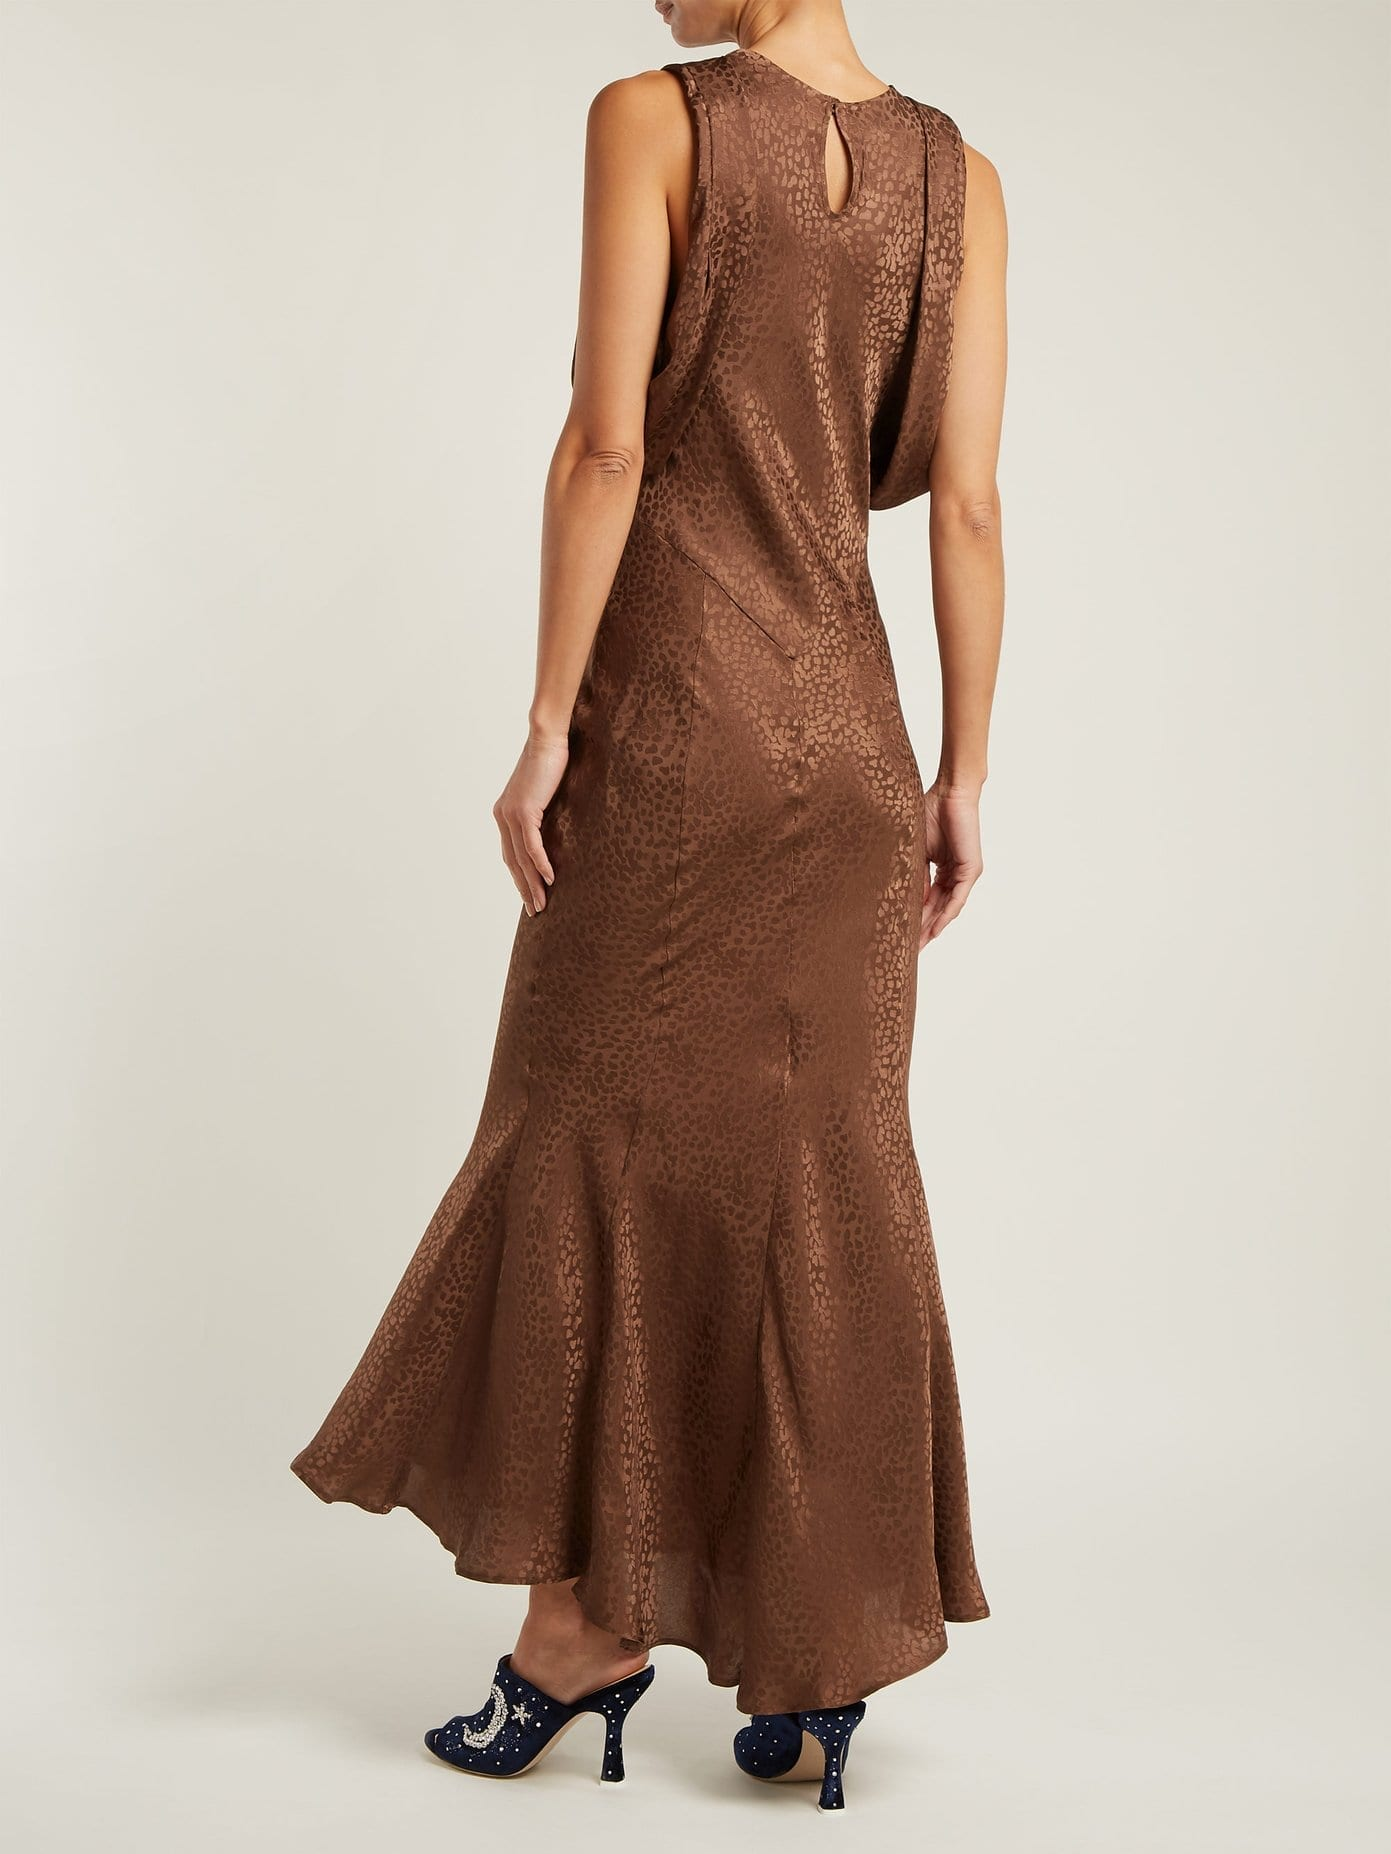 Attico Cheetah Jacquard Silk Draped Sleeved Brown Dress